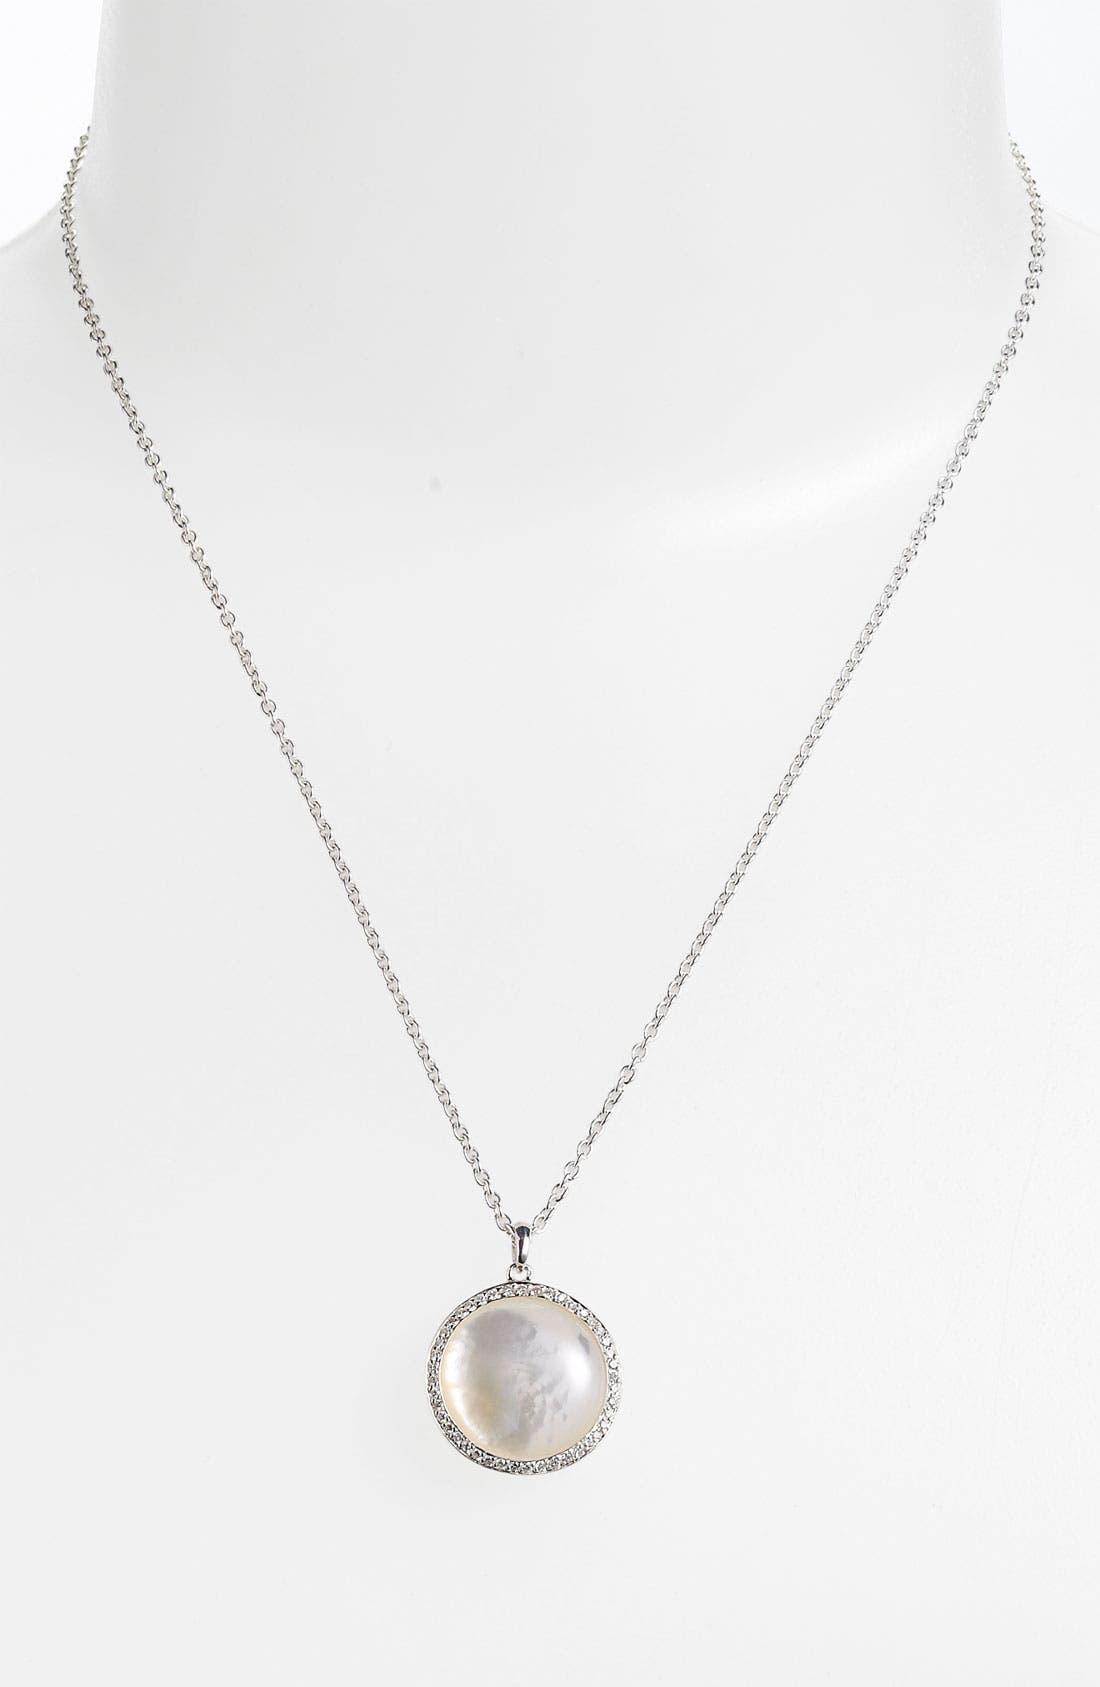 Alternate Image 1 Selected - Ippolita 'Scultura' Medium Circle Pendant Necklace